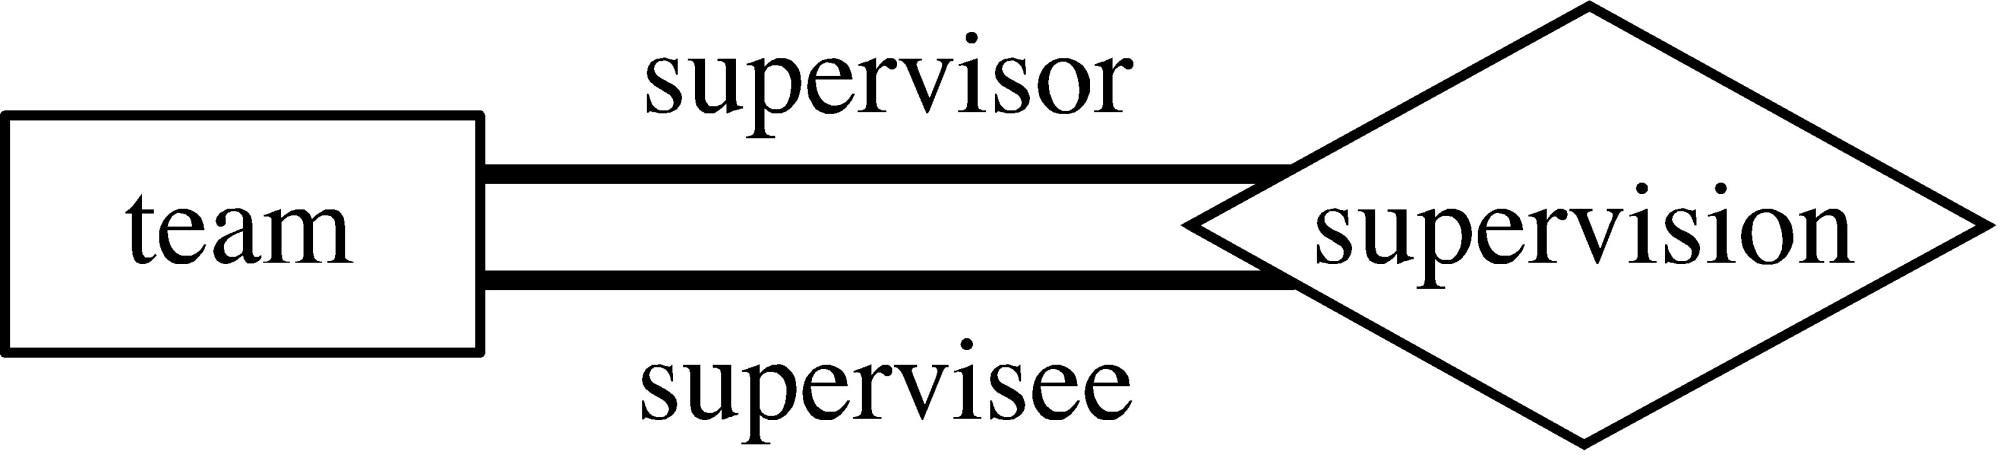 hight resolution of erd diagram oval